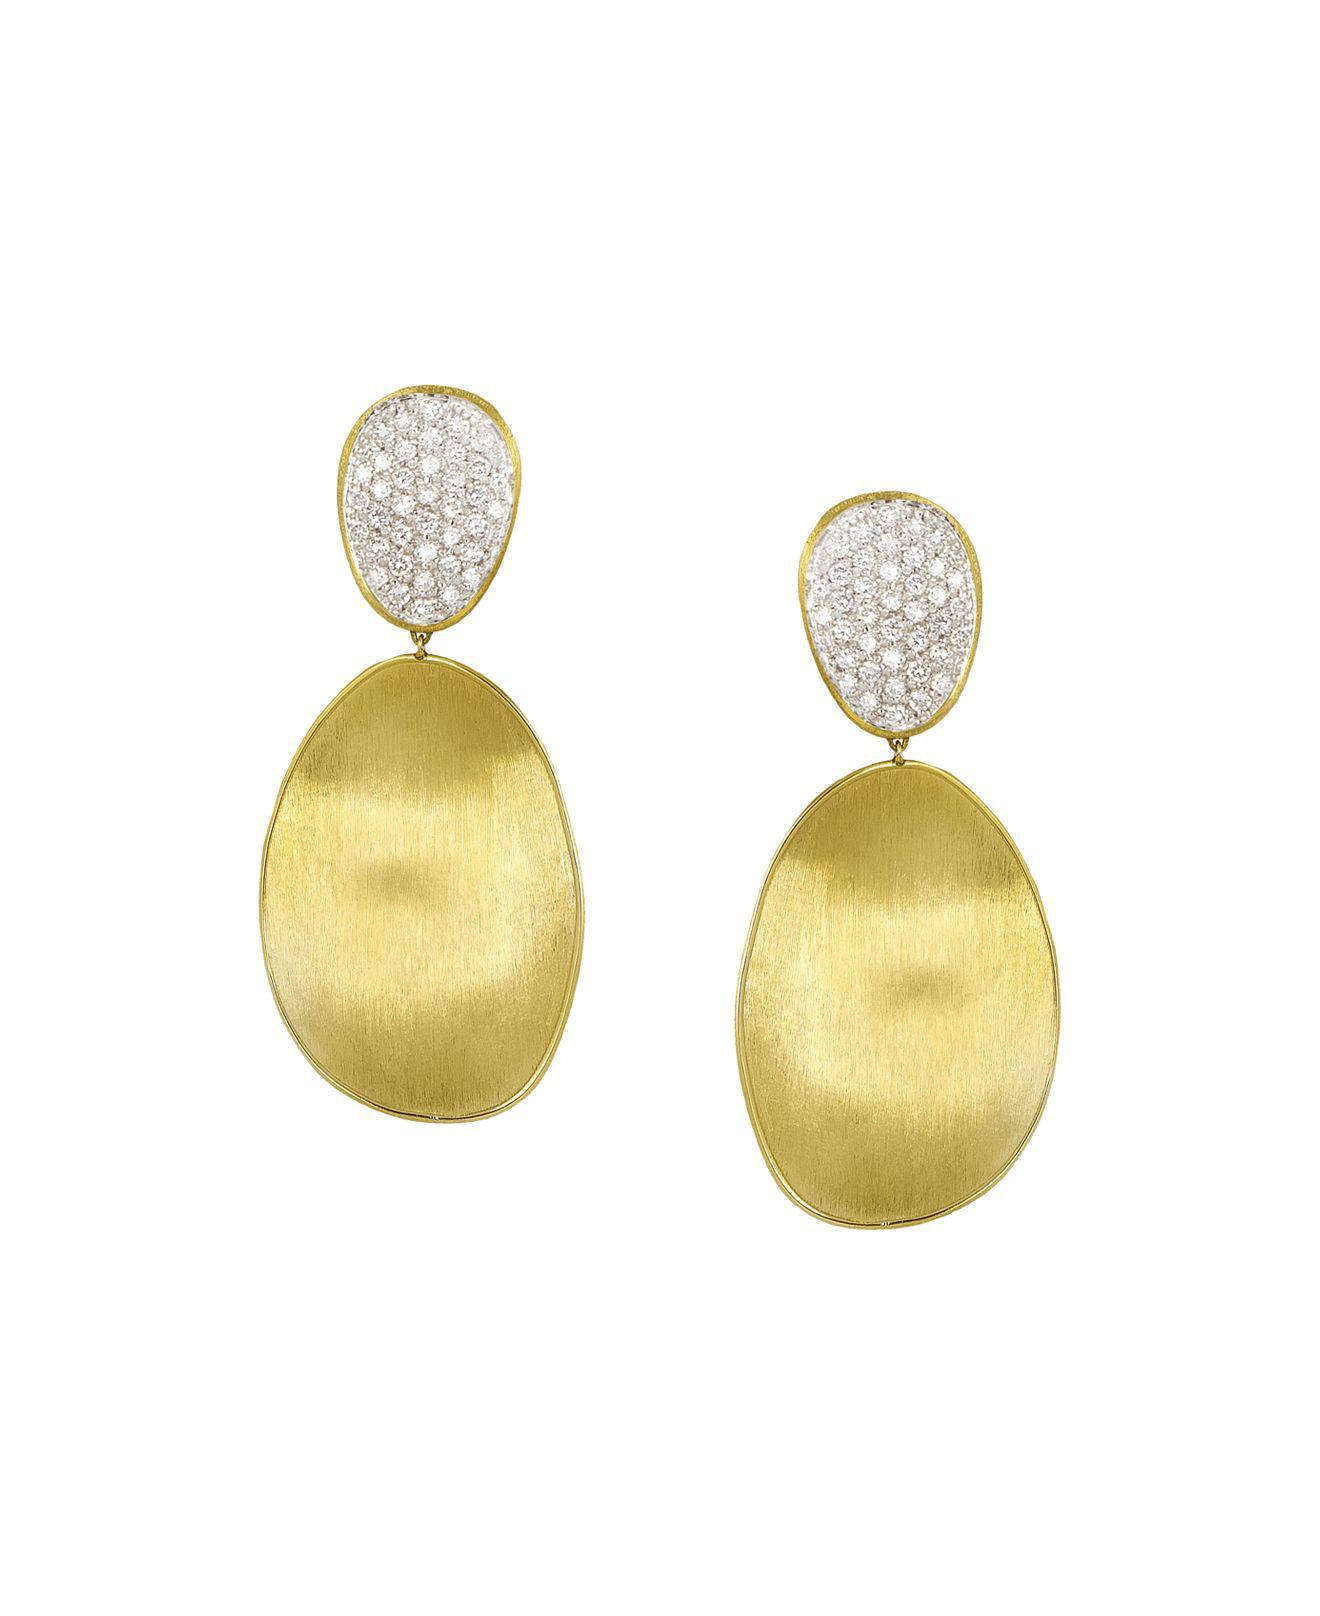 Marco Bicego Large Diamond Lunaria 18k Gold Double-Drop Earrings hpOEBh4GgS